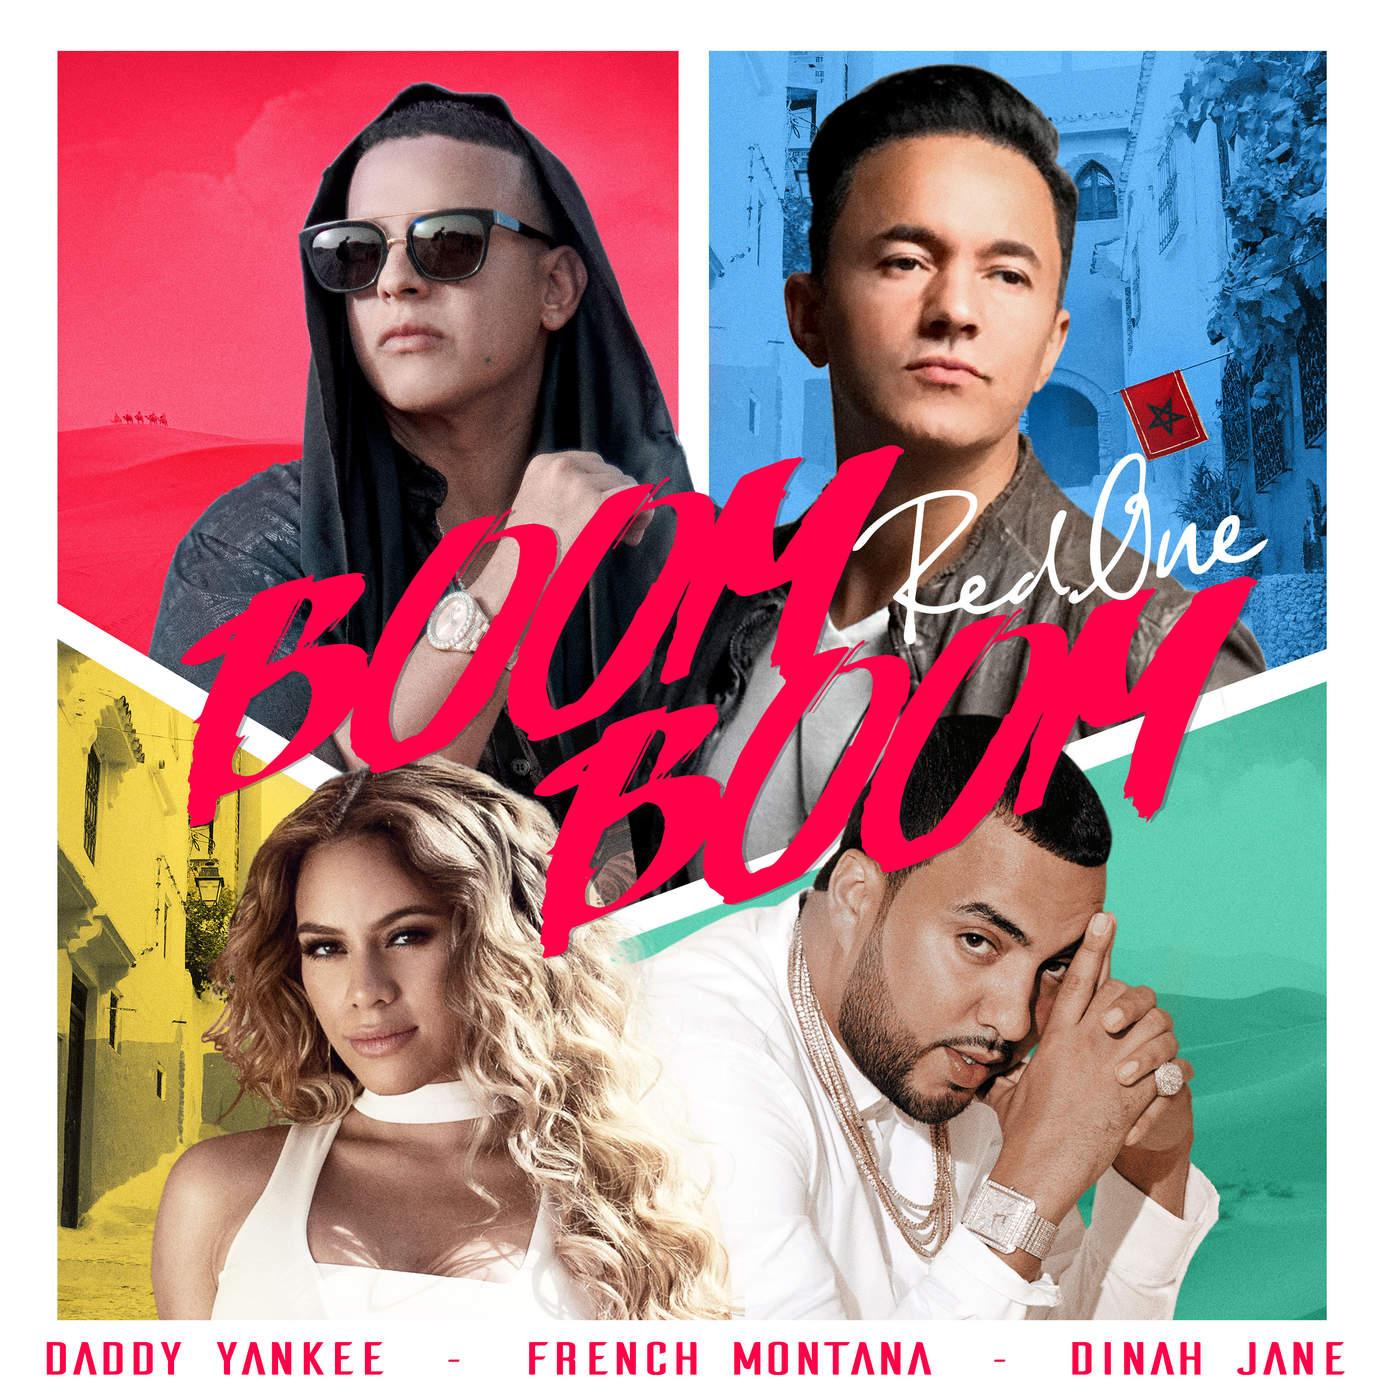 RedOne, Daddy Yankee, French Montana & Dinah Jane - Boom Boom - Single